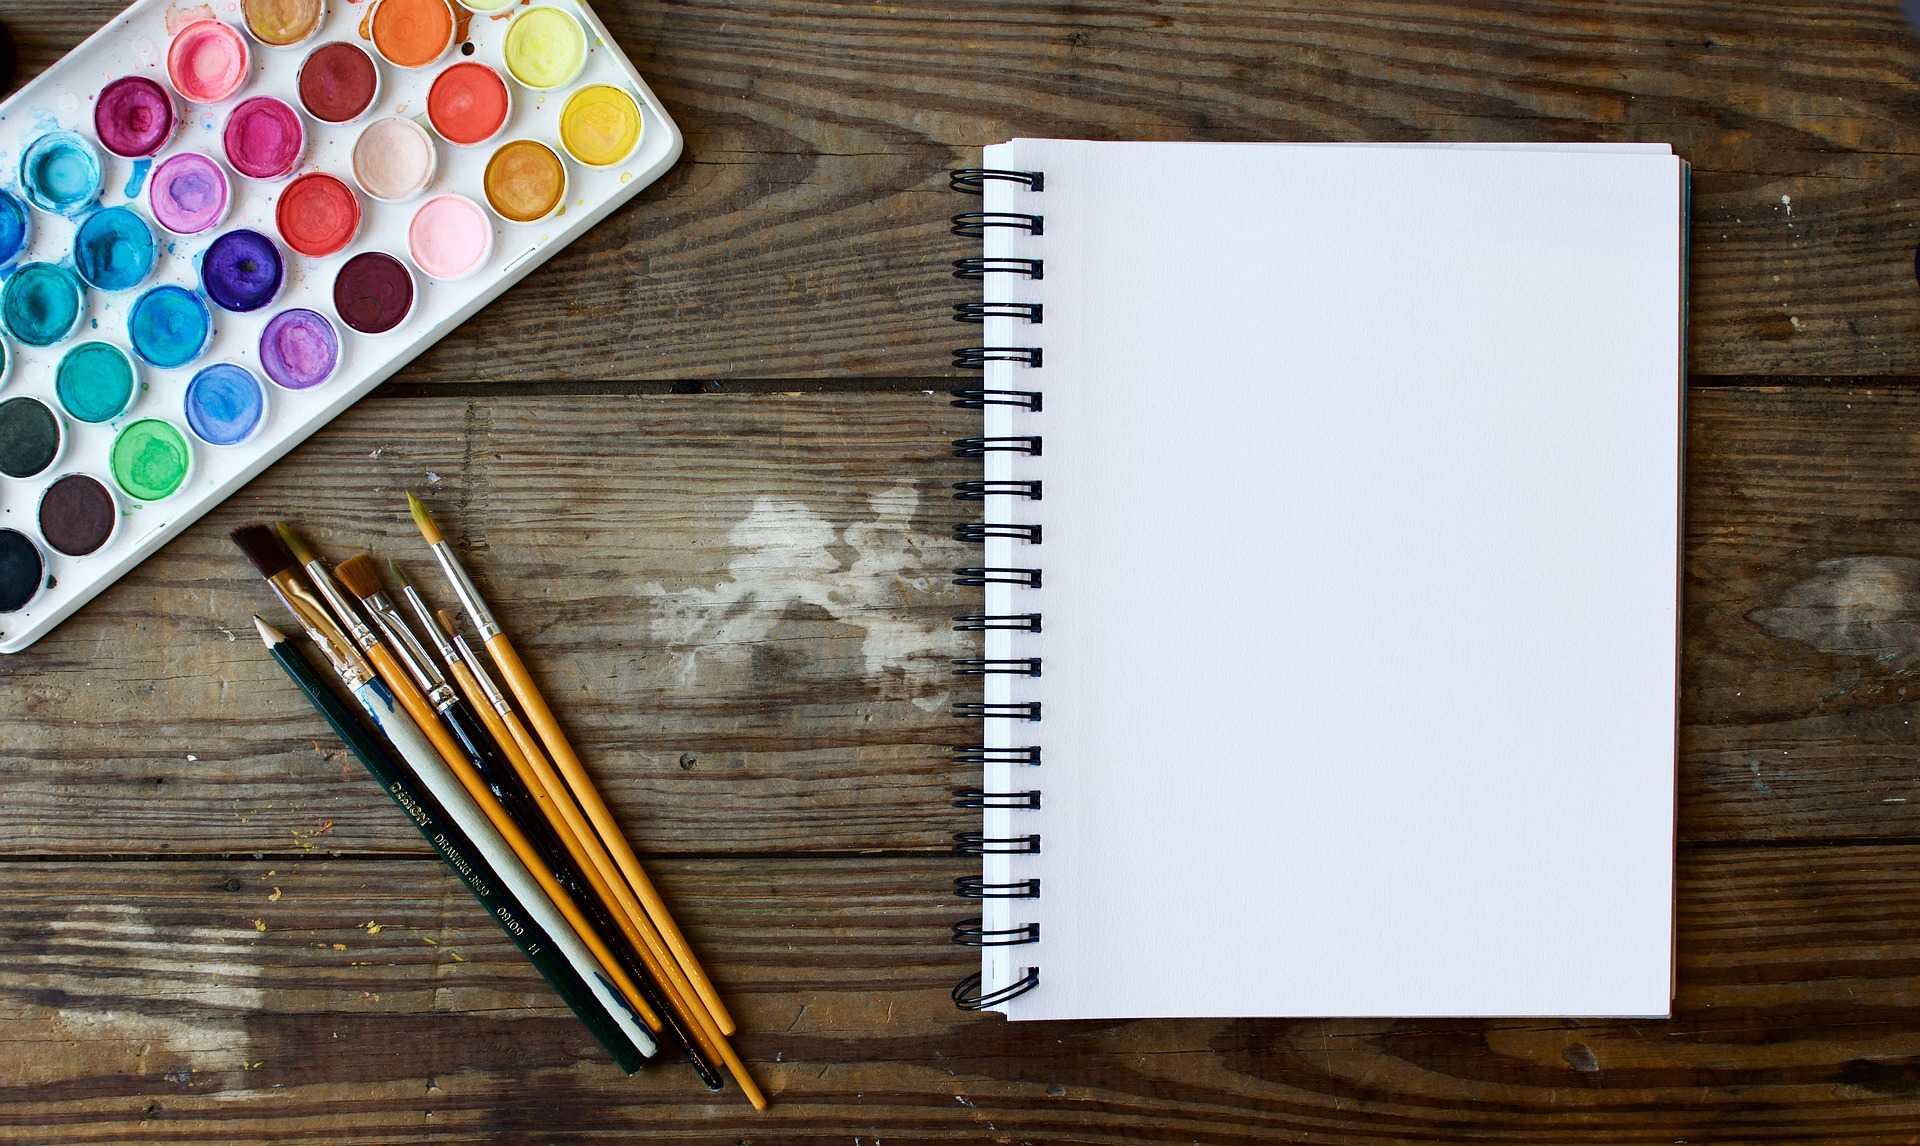 background noise helps creativity